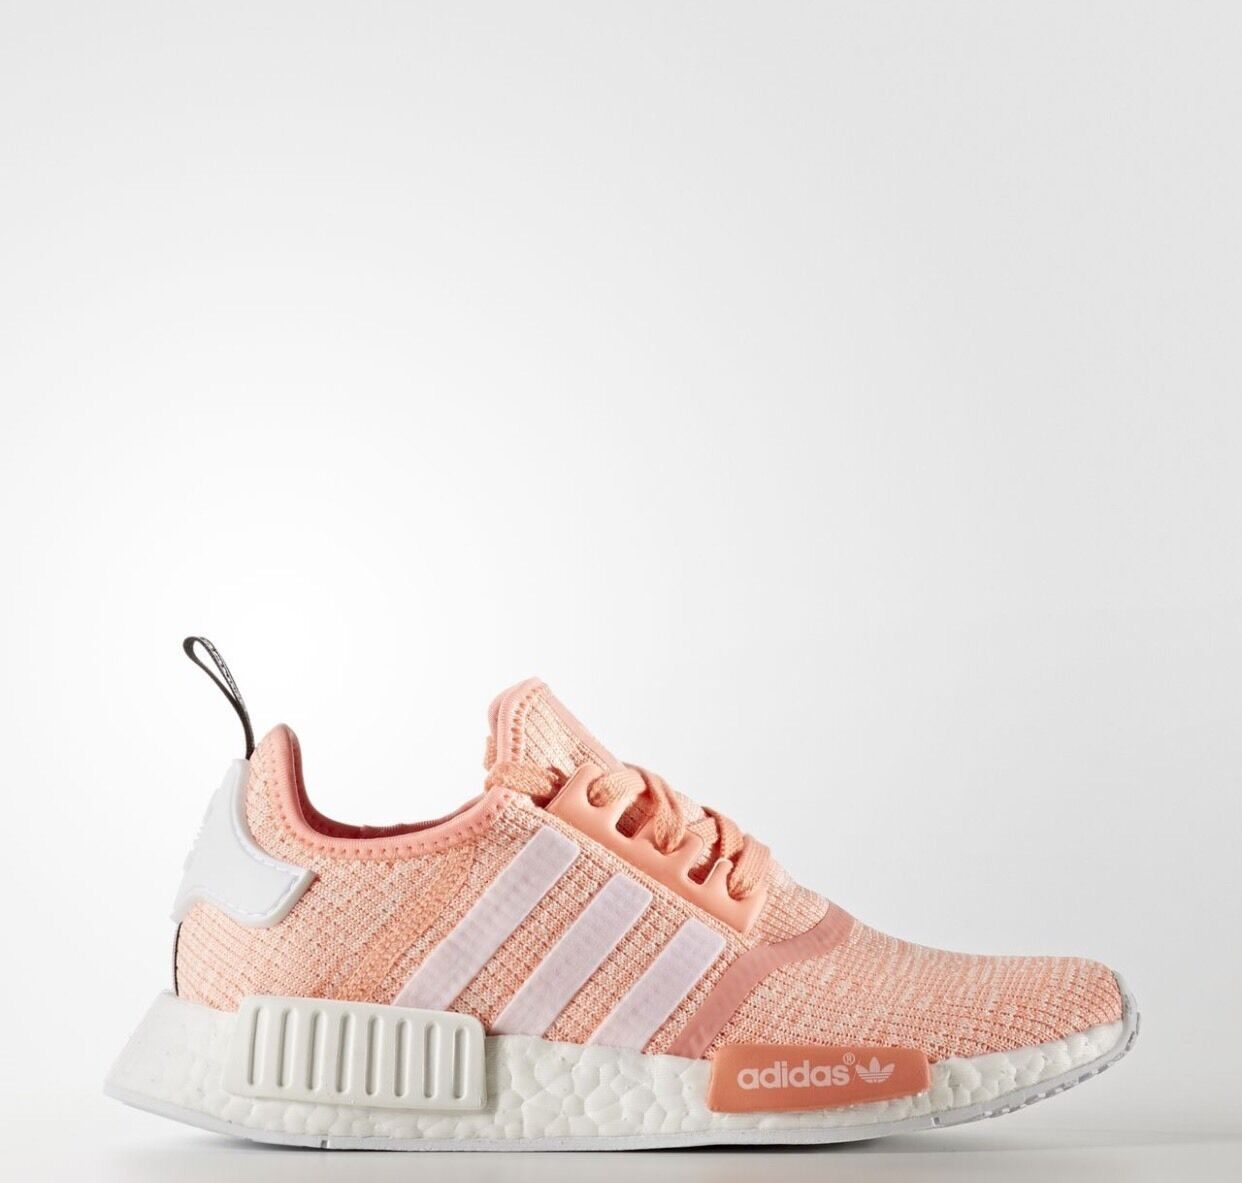 Adidas NMD R1 R1 R1 Mesh  Sun Glow  Pink pink Peach Women's Size 7 BY3034 fda517